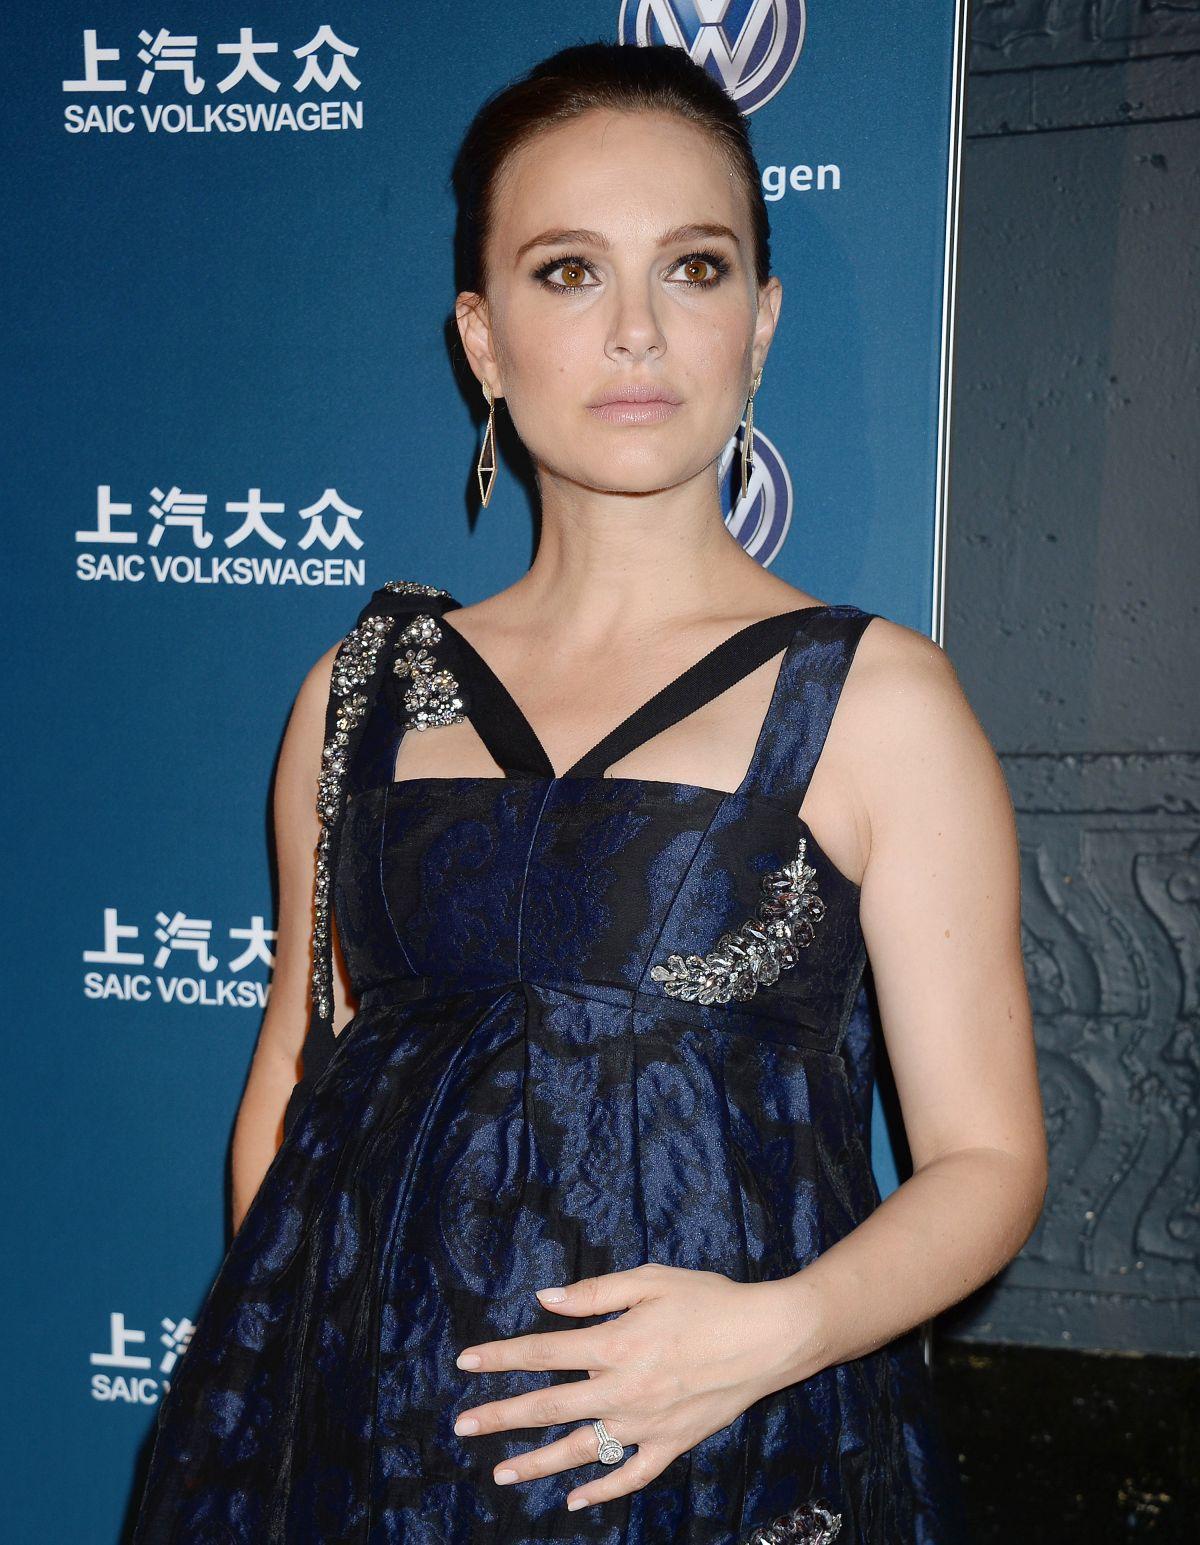 Pregnant NATALIE PORTMAN at 2016 Huading Global Film Awards in Los Angeles 12/15/2016